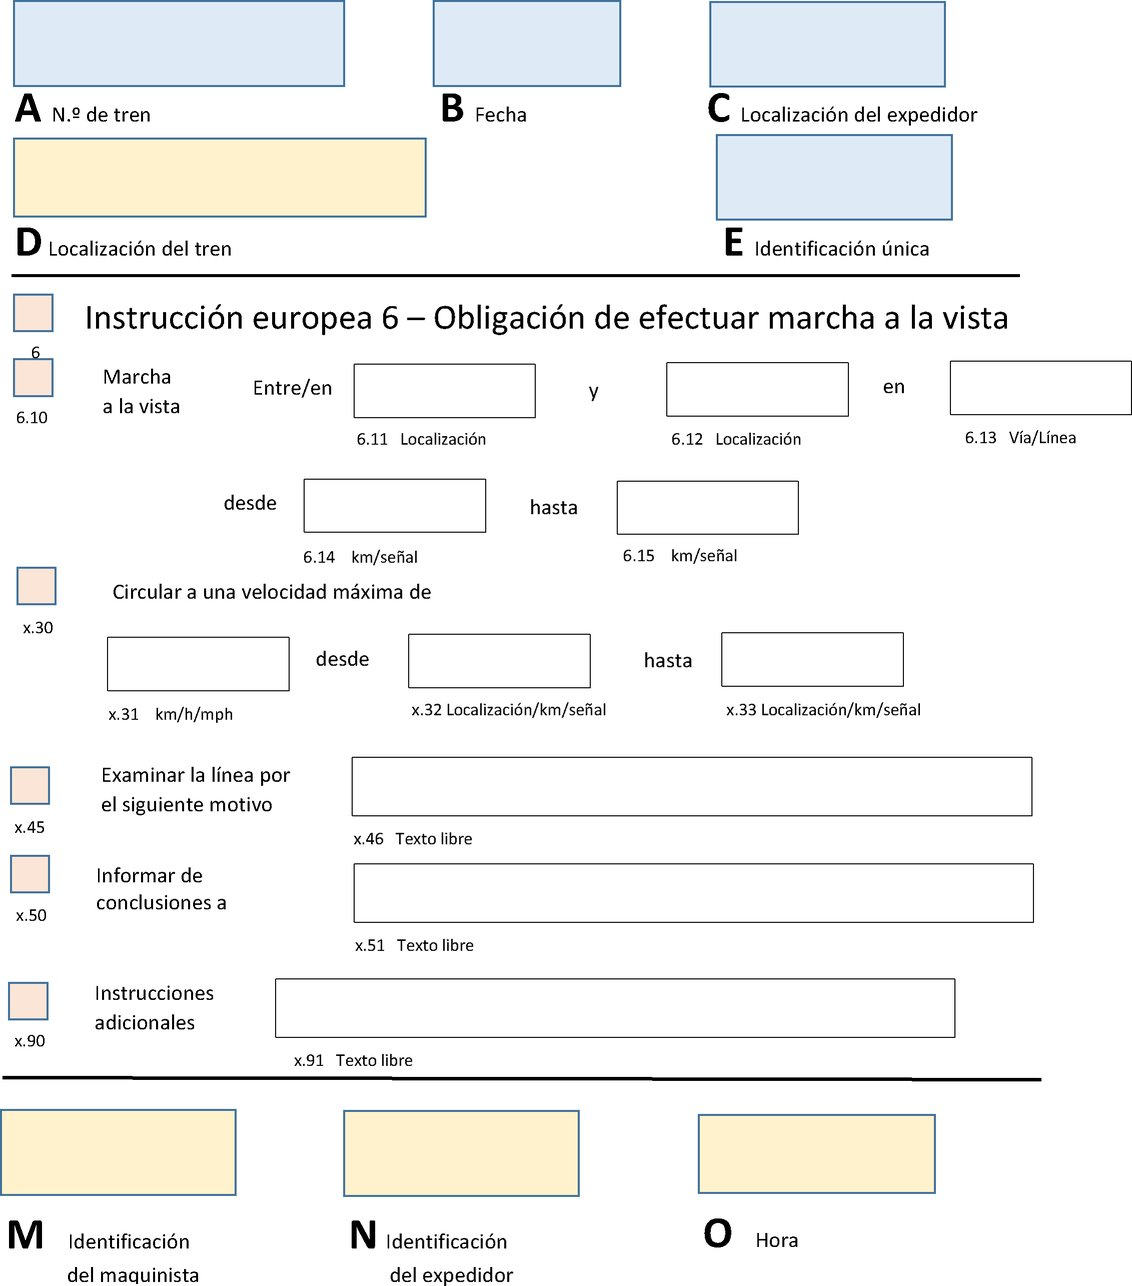 Imagen: https://eur-lex.europa.eu/resource.html?uri=uriserv:OJ.LI.2019.139.01.0005.01.SPA.xhtml.LI2019139ES.01005801.tif.jpg